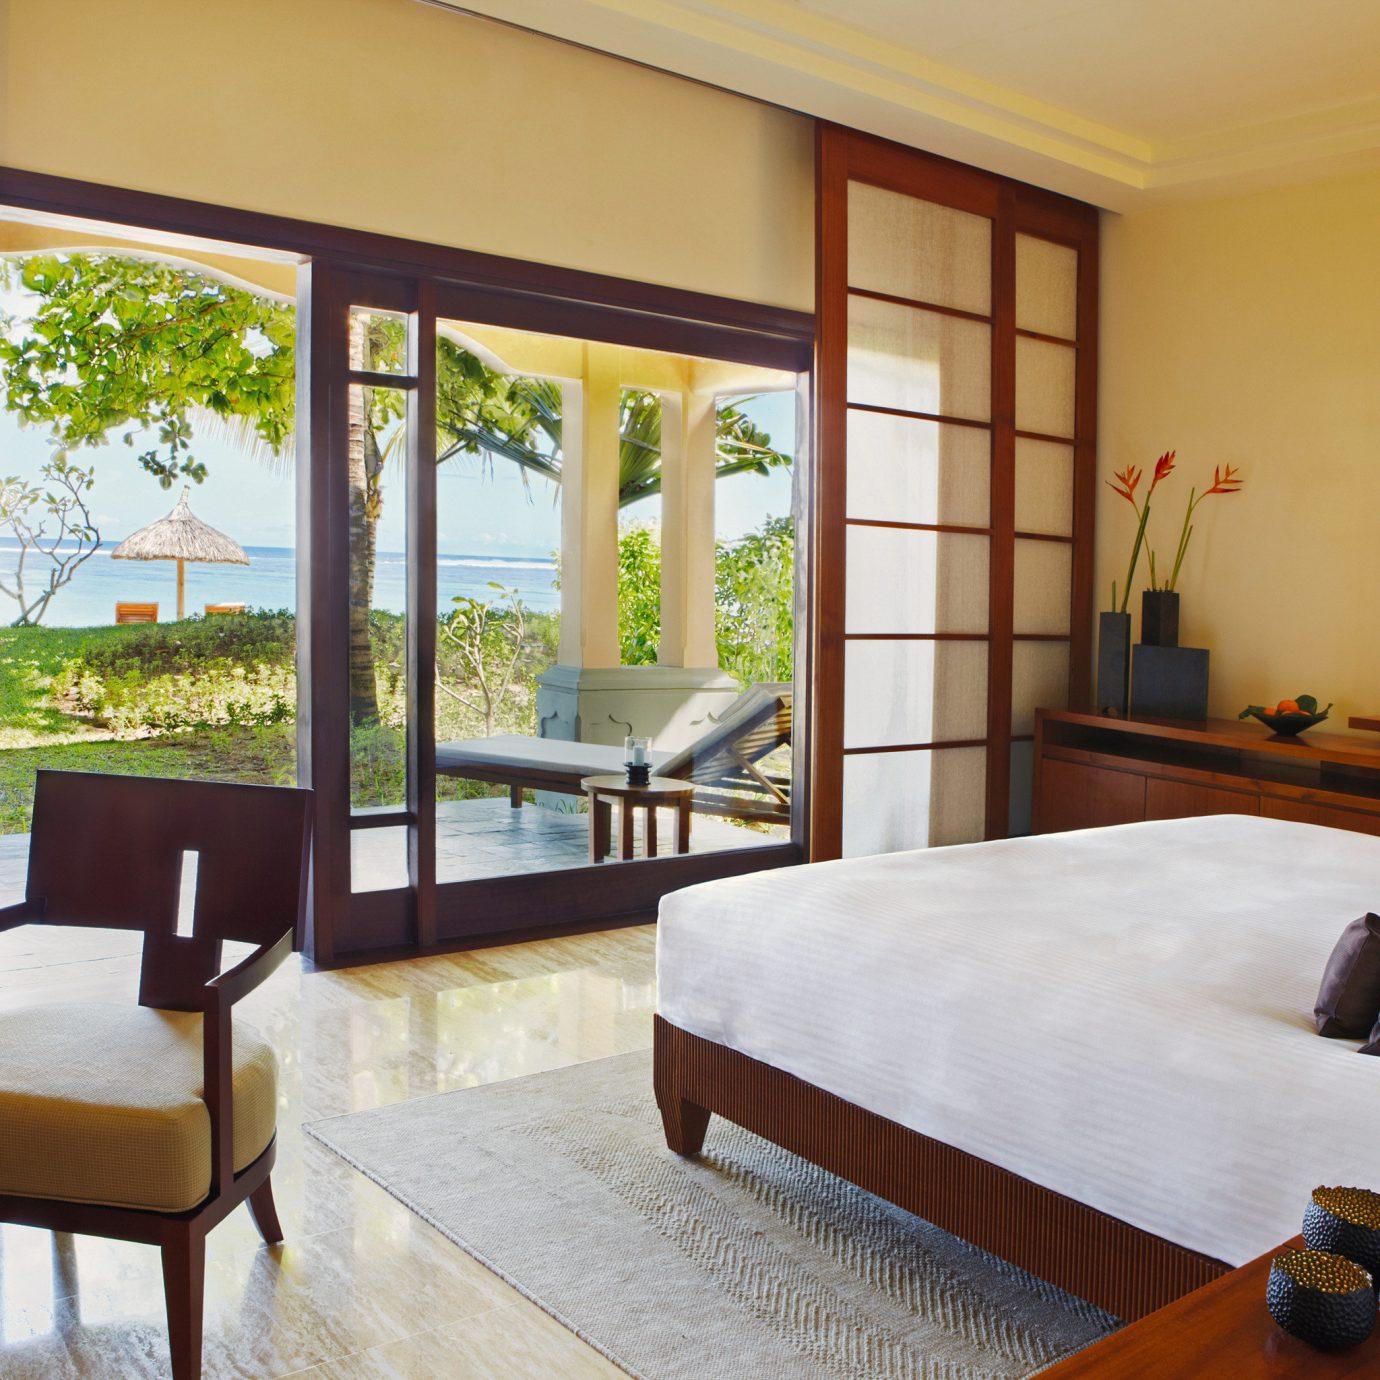 Beachfront Bedroom Island Luxury Romance Romantic property home living room Suite Resort Villa condominium cottage